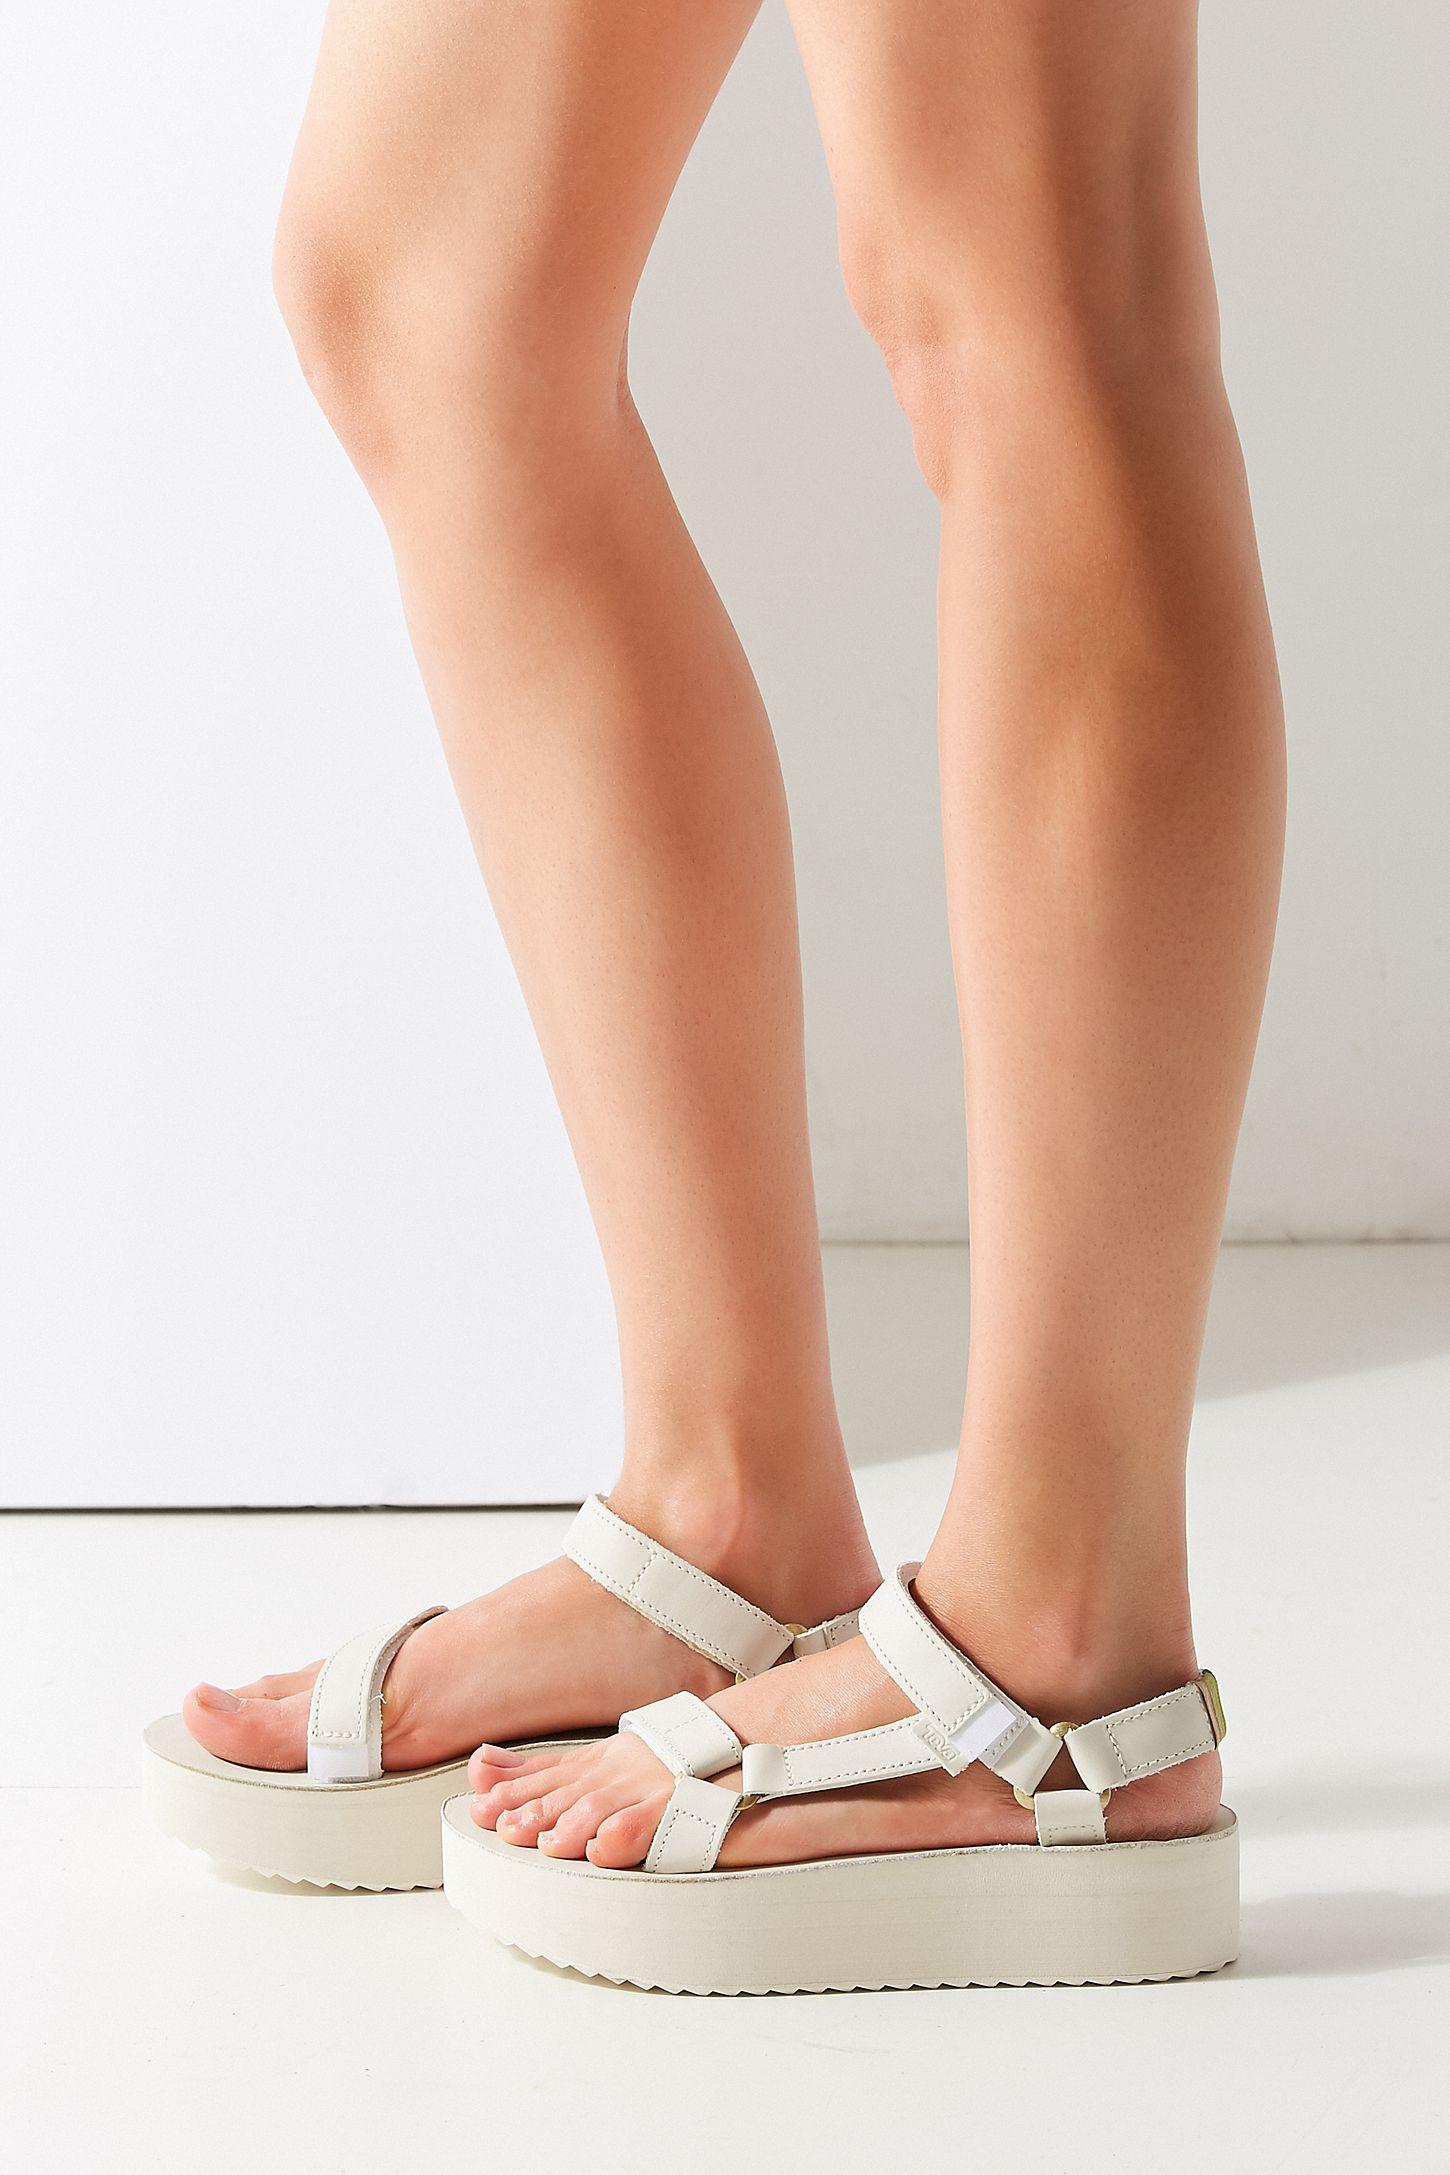 30f5e6d2841 Teva Universal Crafted Flatform Sandal